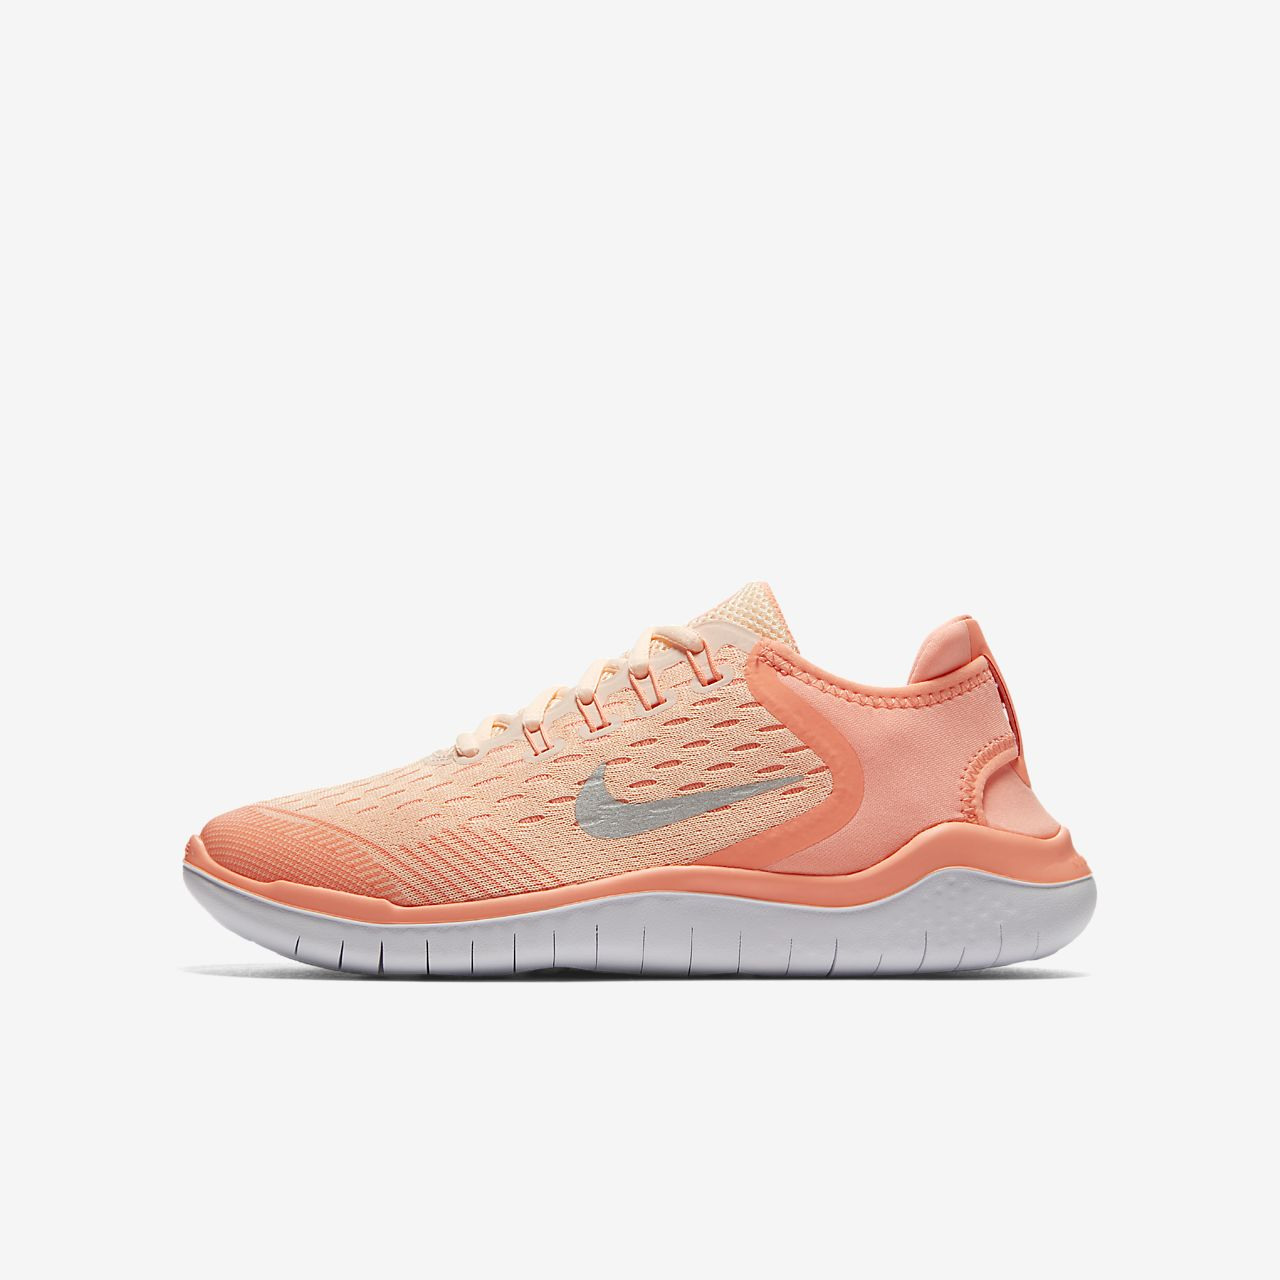 1459a99ec3b31 ... wholesale nike free rn 2018 older kids running shoe 71b98 79f73